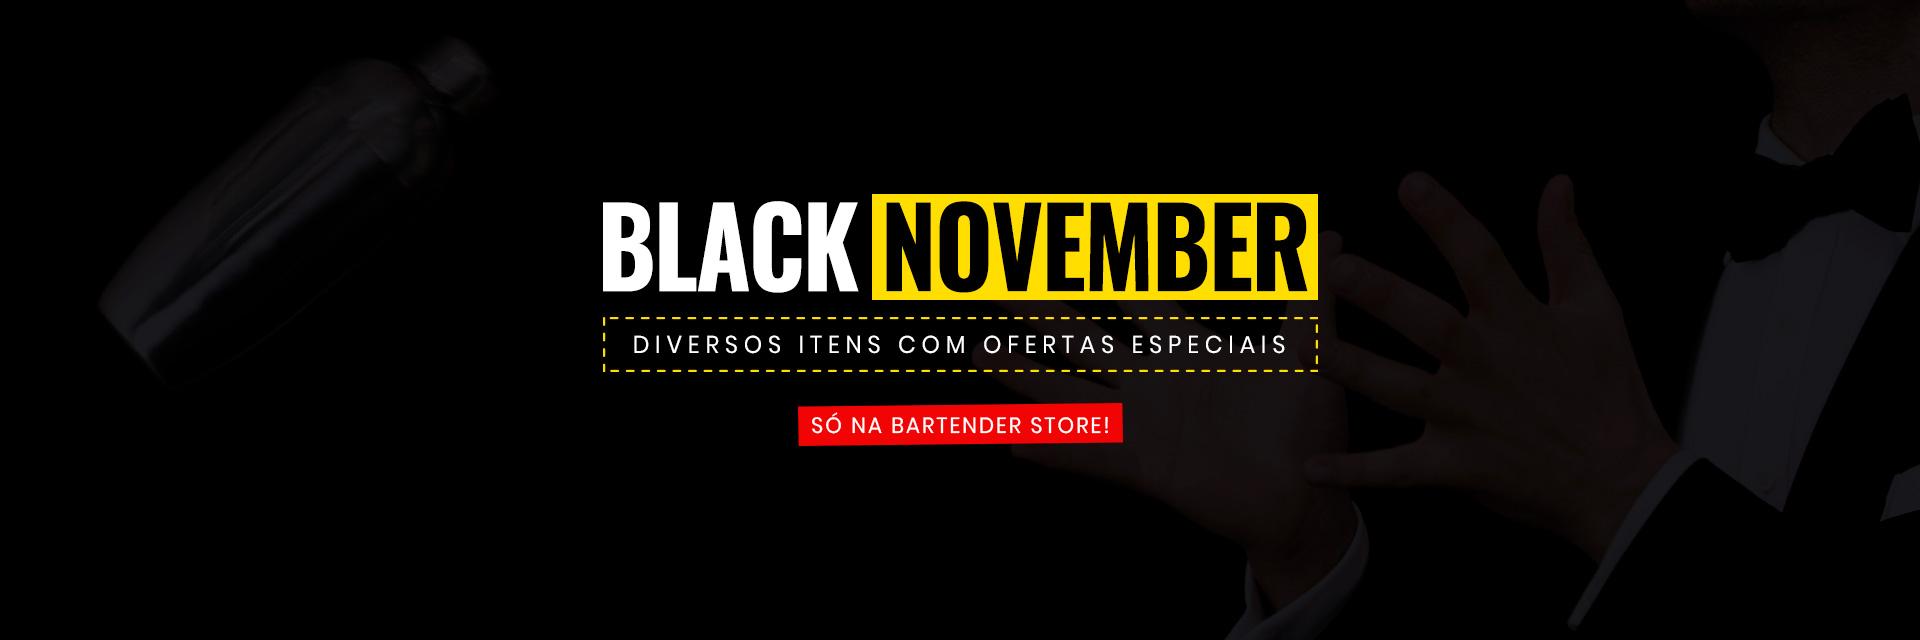 Black November - Black Friday na Bartender Store